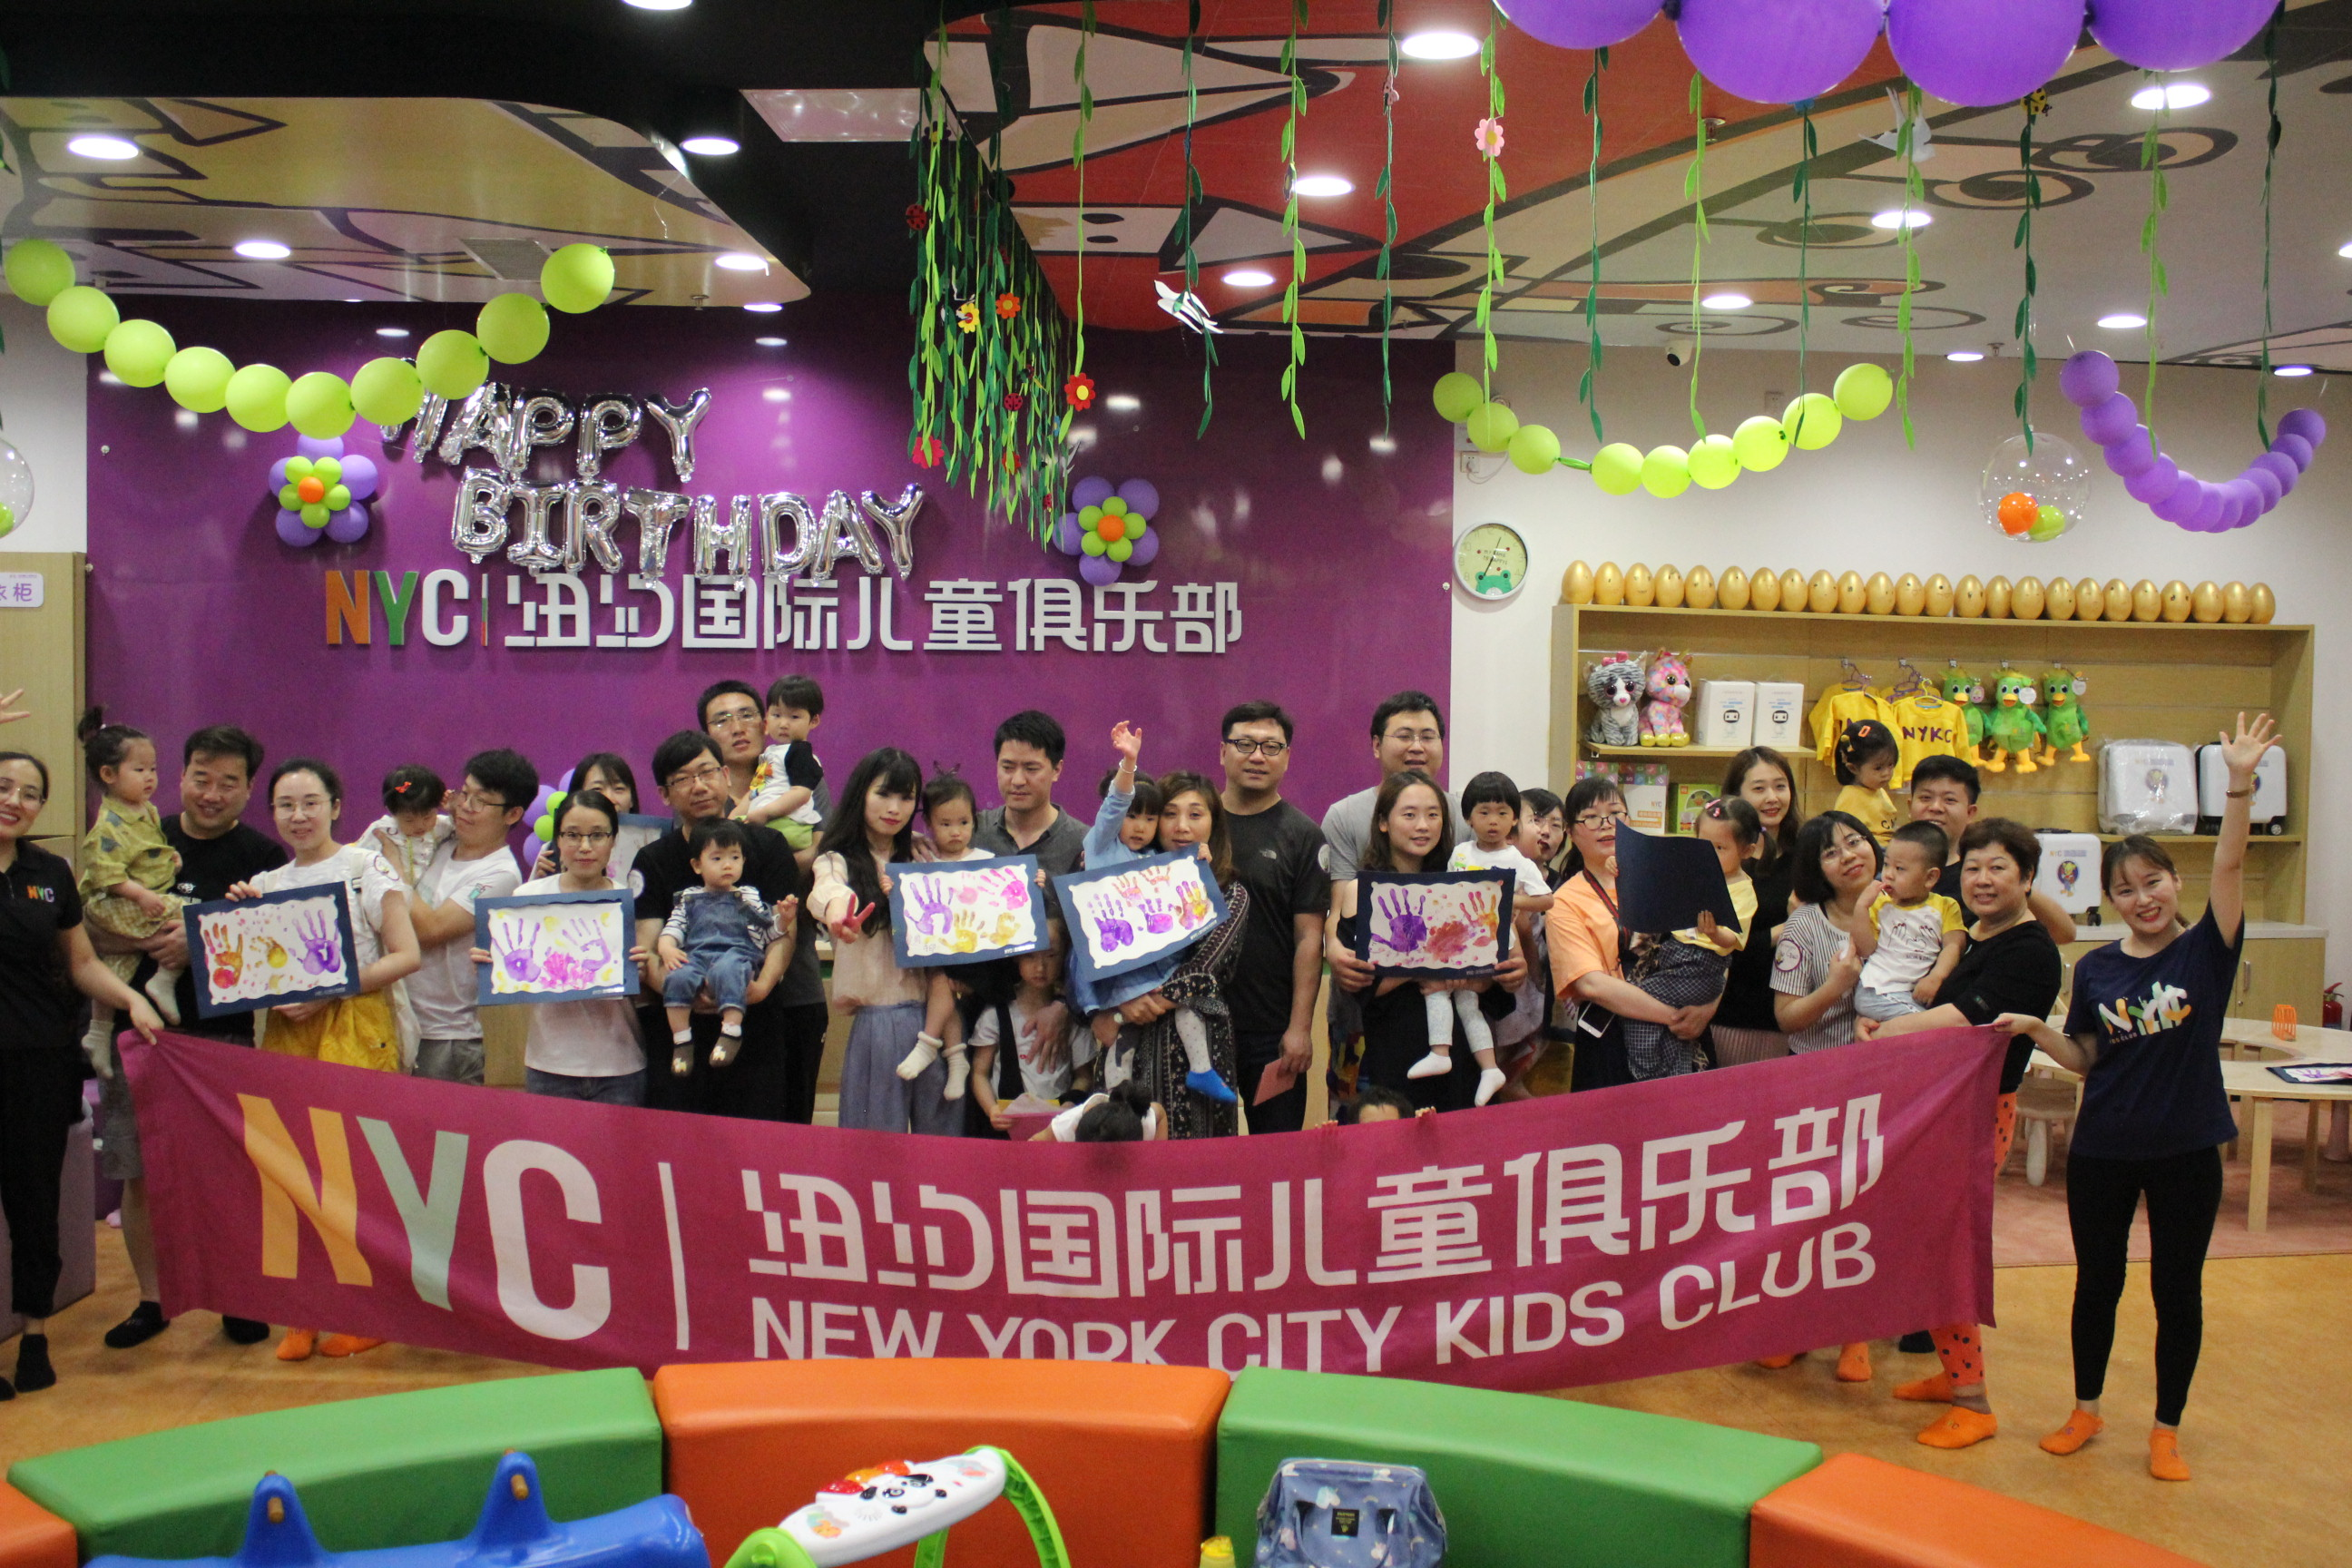 NYC纽约国际邯郸早教中心:我爱我家·世界家庭日主题派对回顾